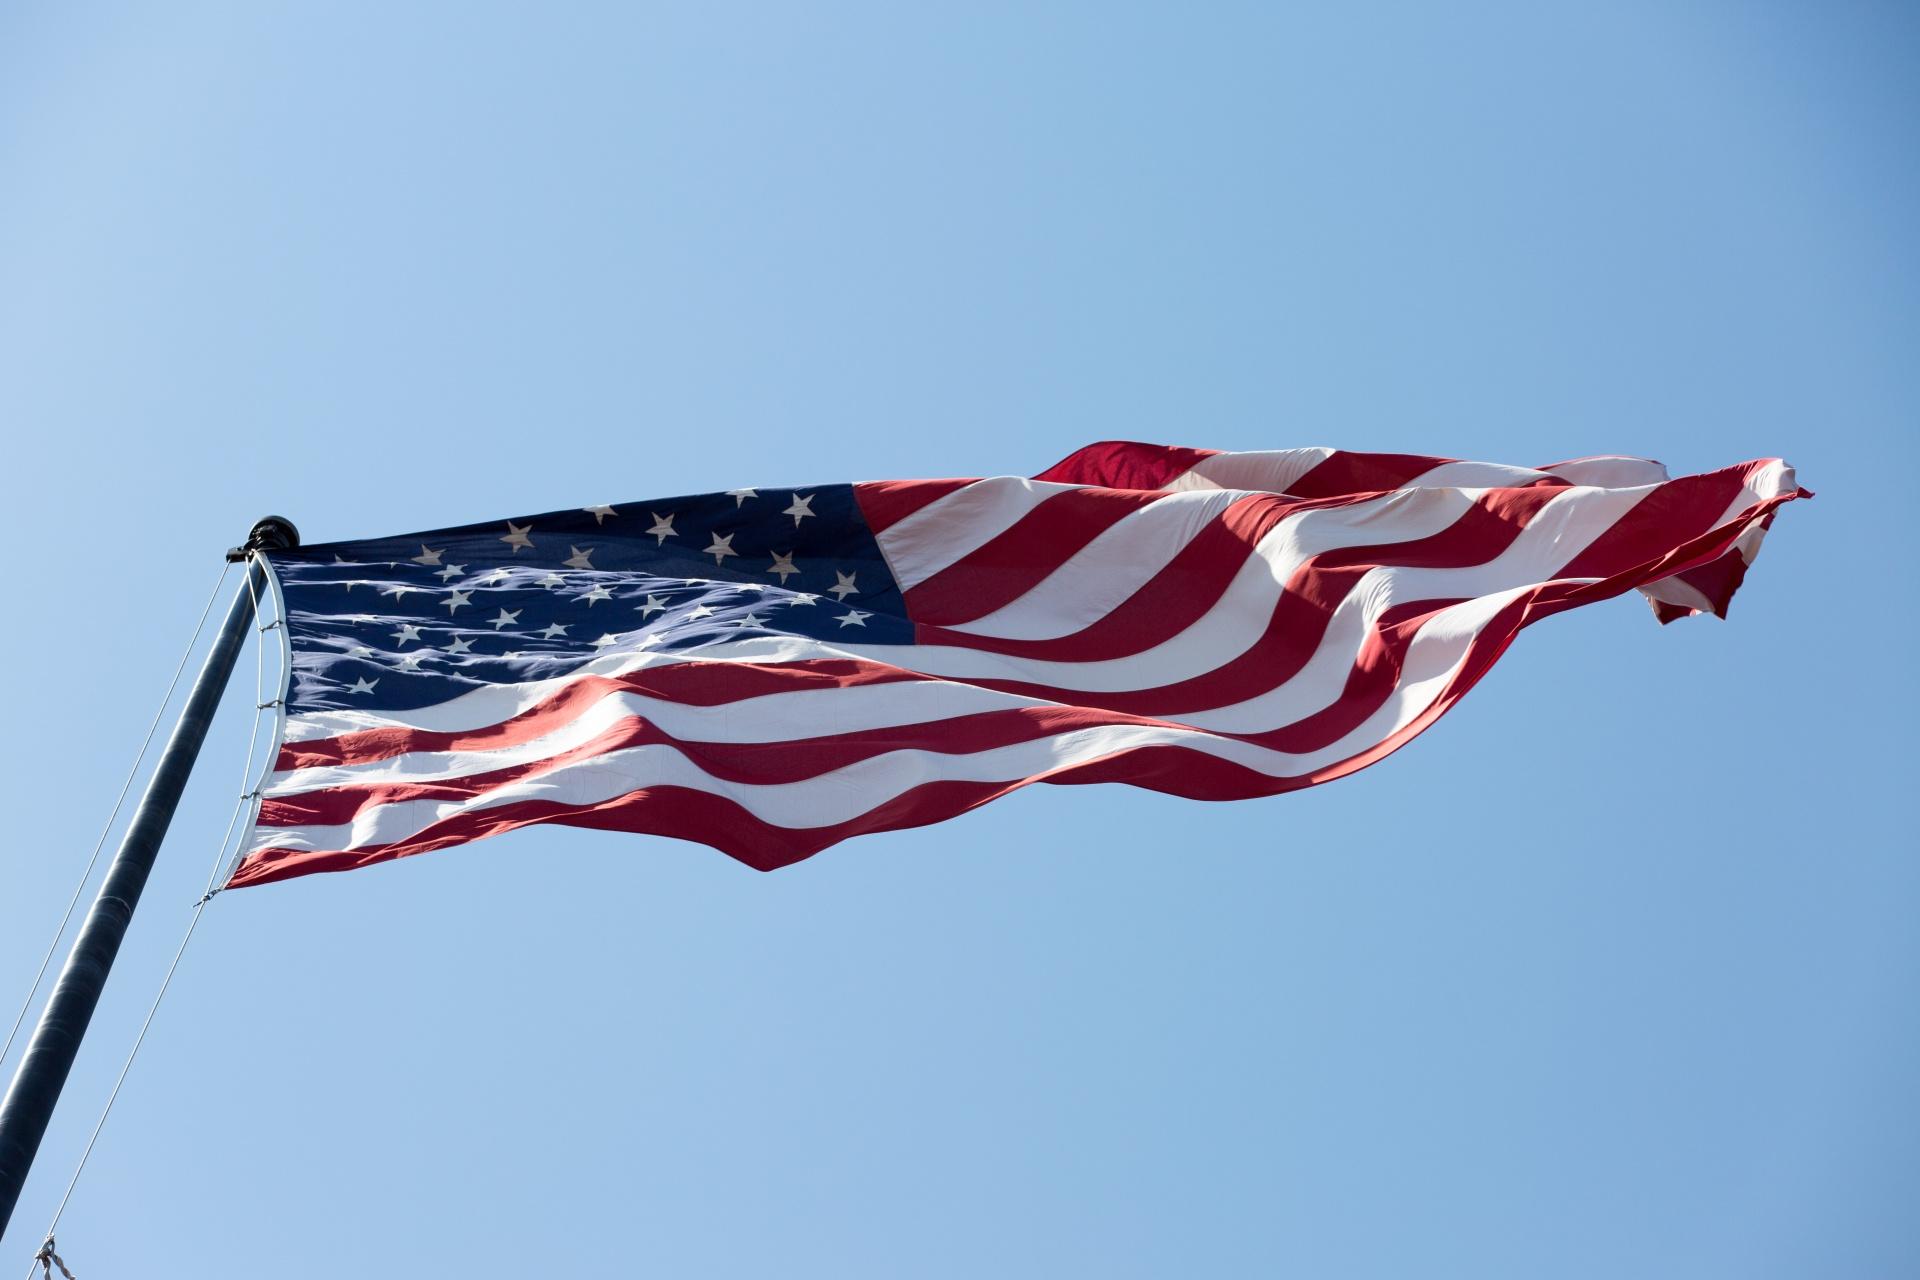 united-states-of-america-flag-1462905064LFm